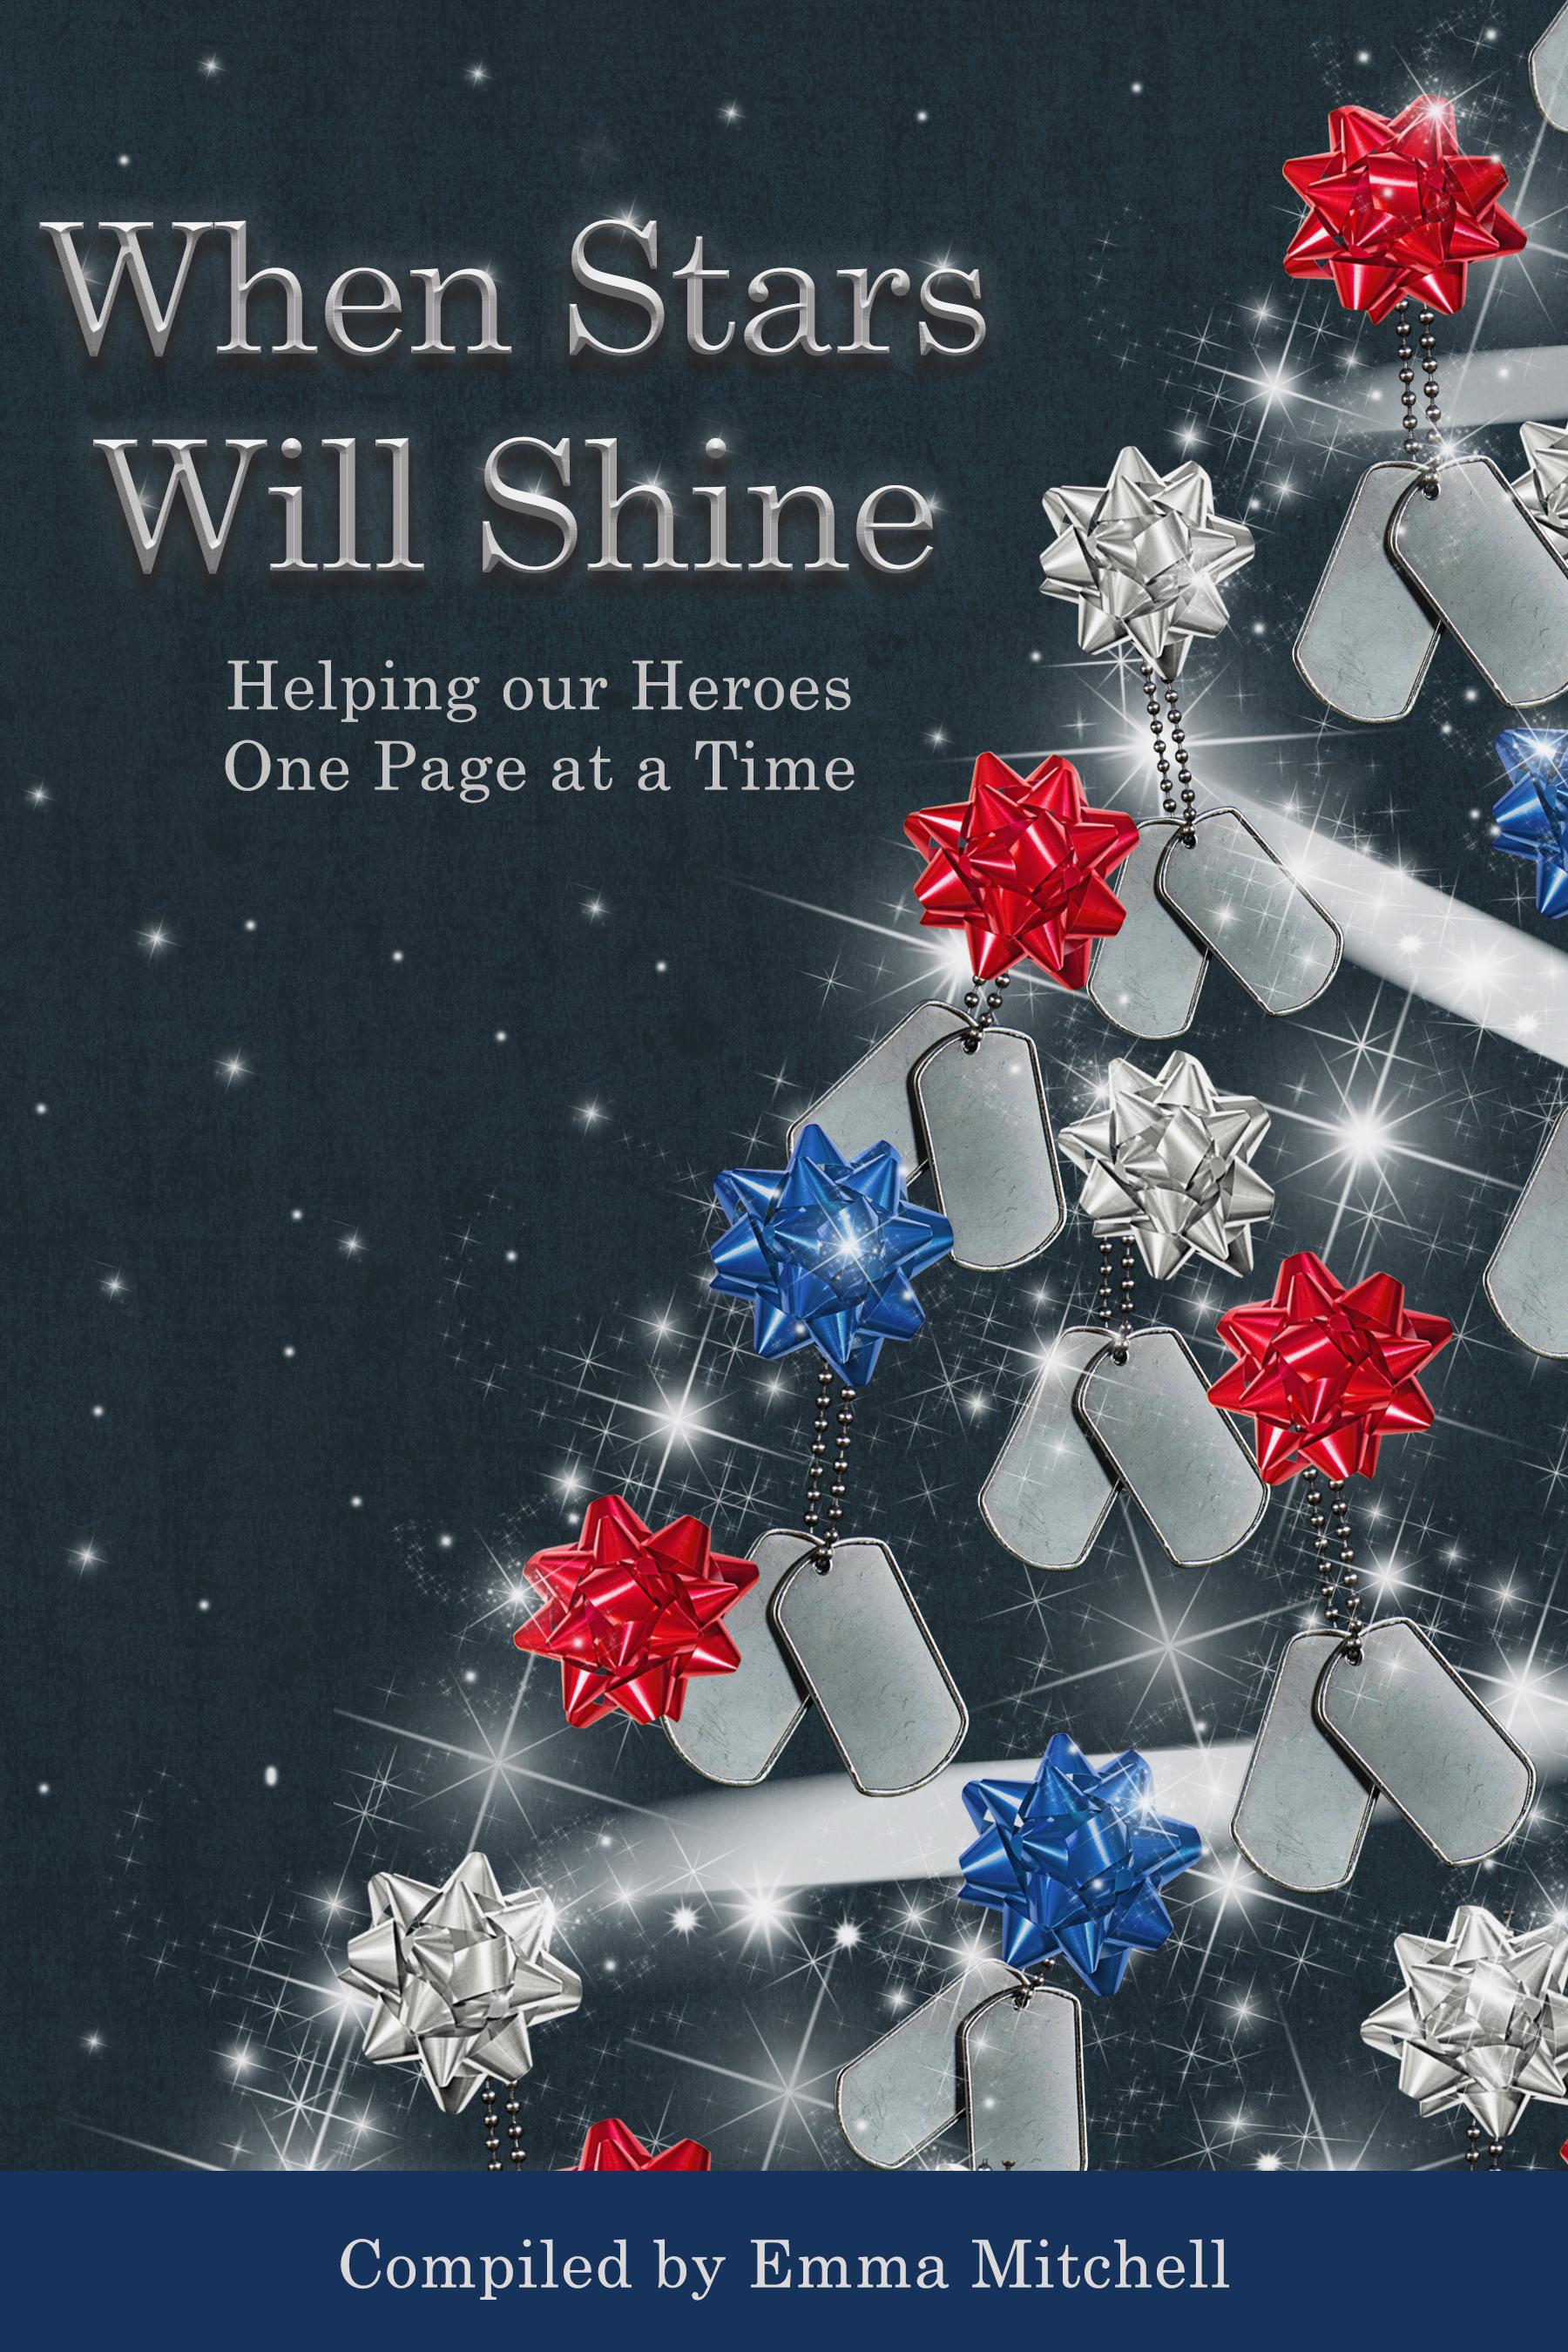 When Stars Will Shine: An Anthology compiled by Emma Mitchell @emmamitchellfpr #WhenStarsWillShine #bookpromo #H4HAnthology